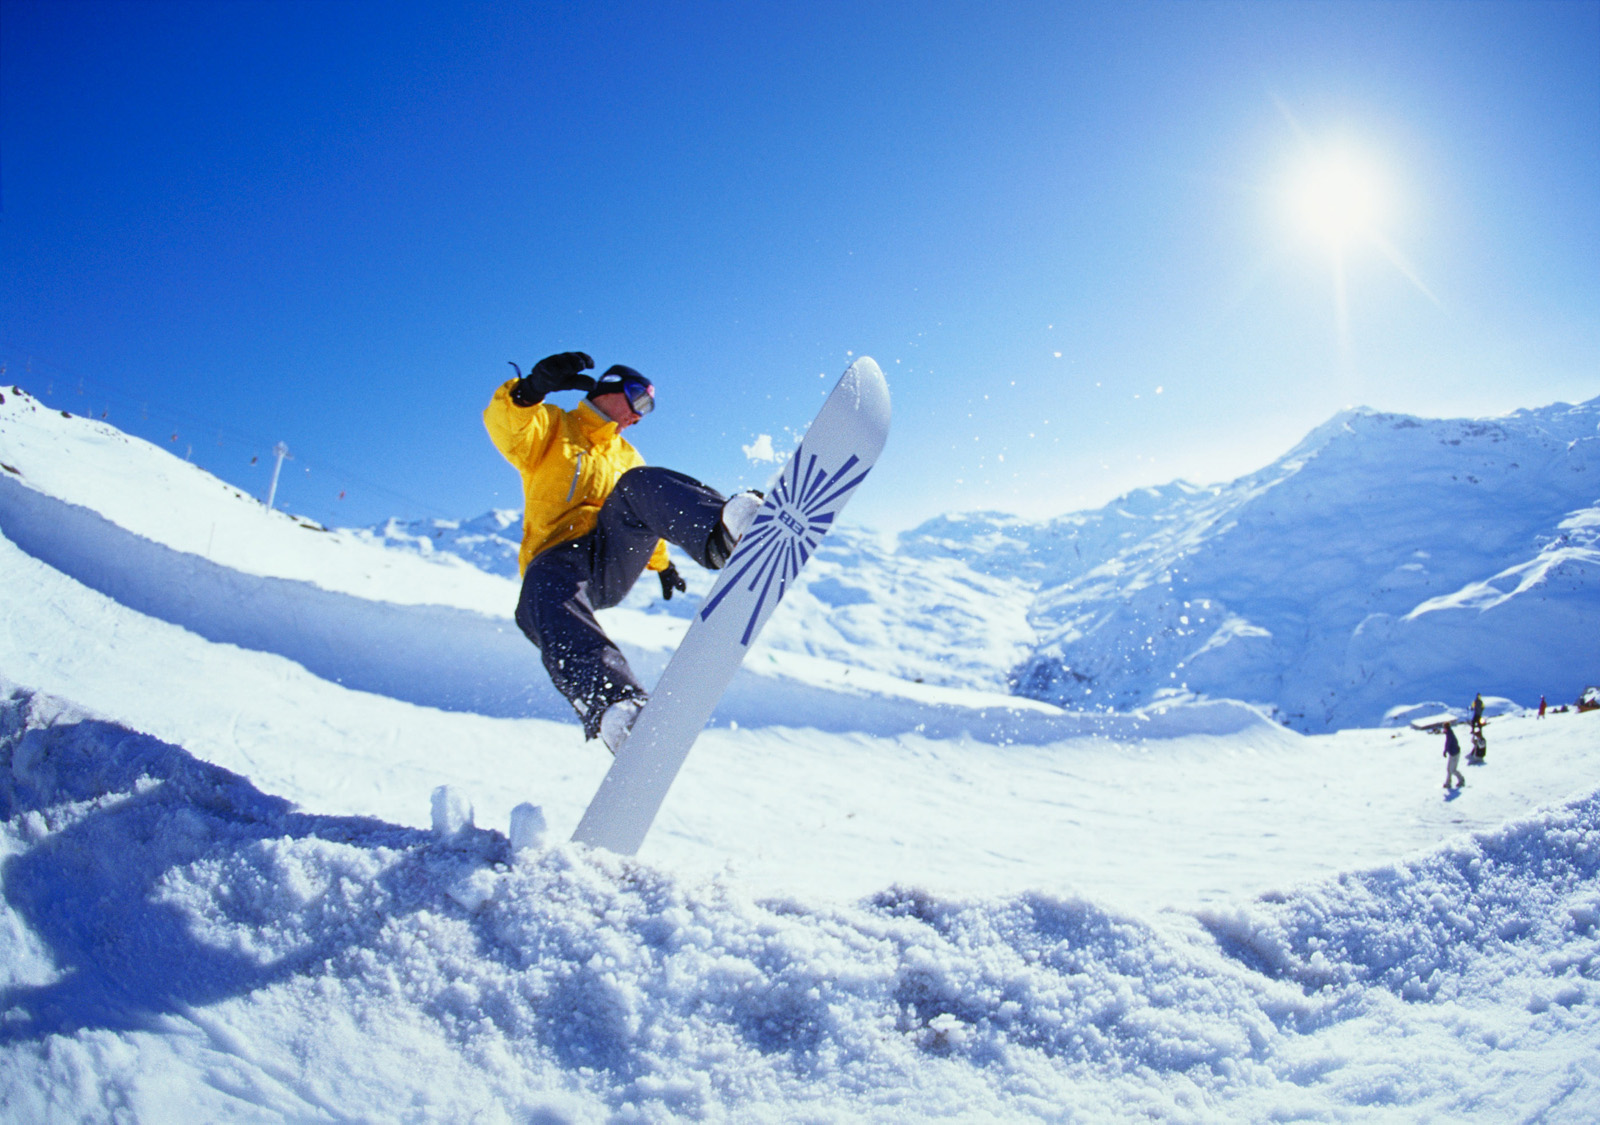 snowboarding-snowboard-free-469315